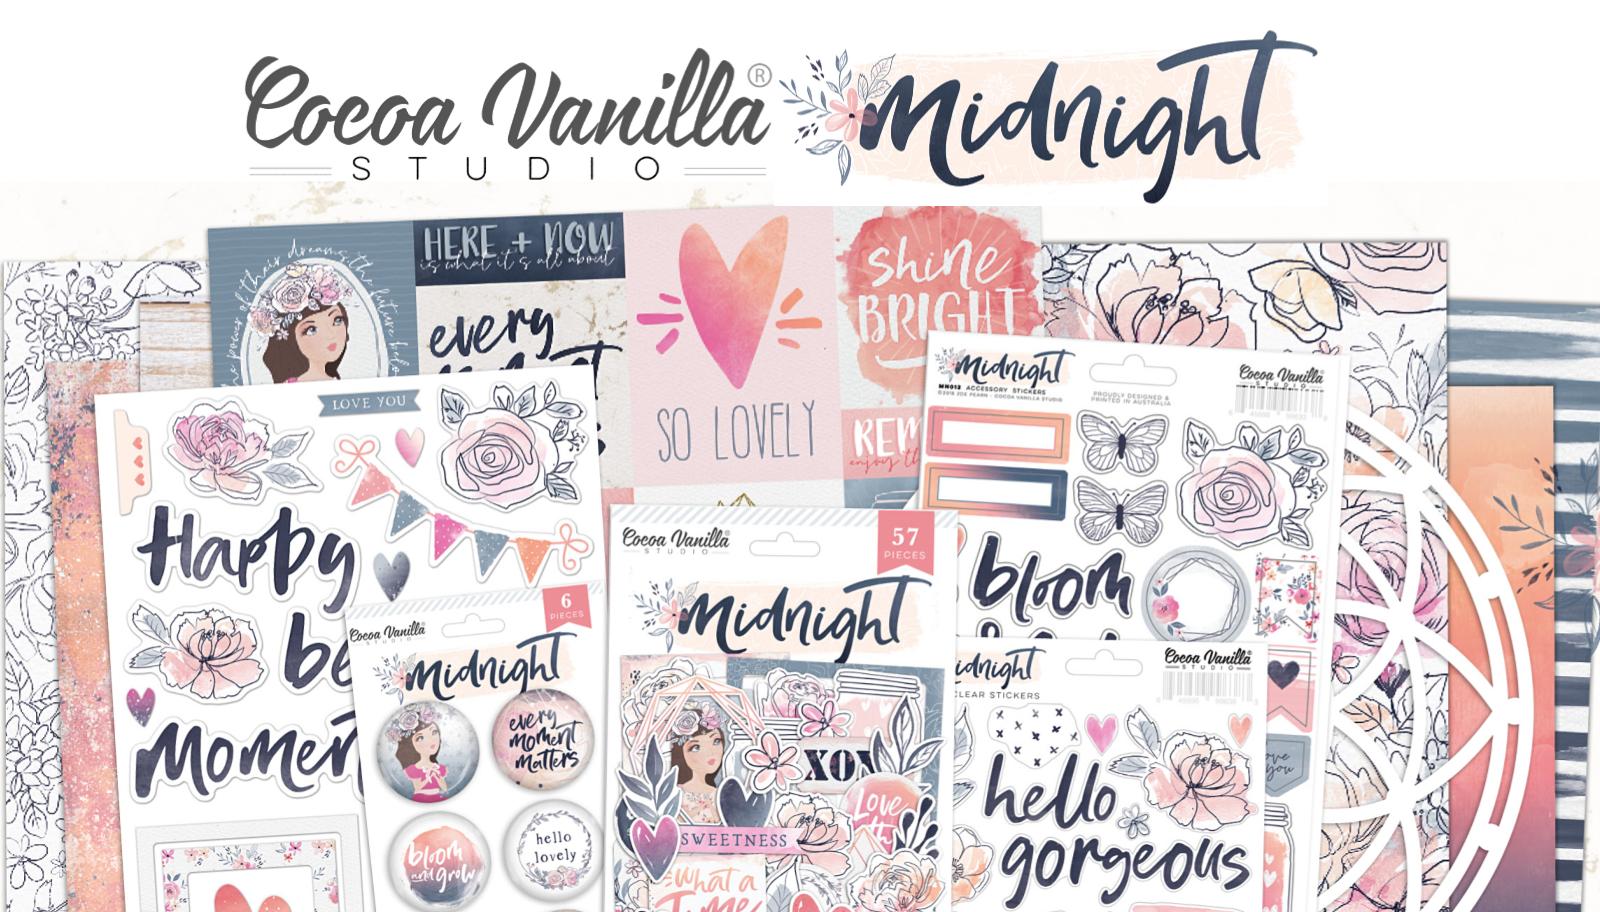 Cocoa Vanilla Studio - Midnight